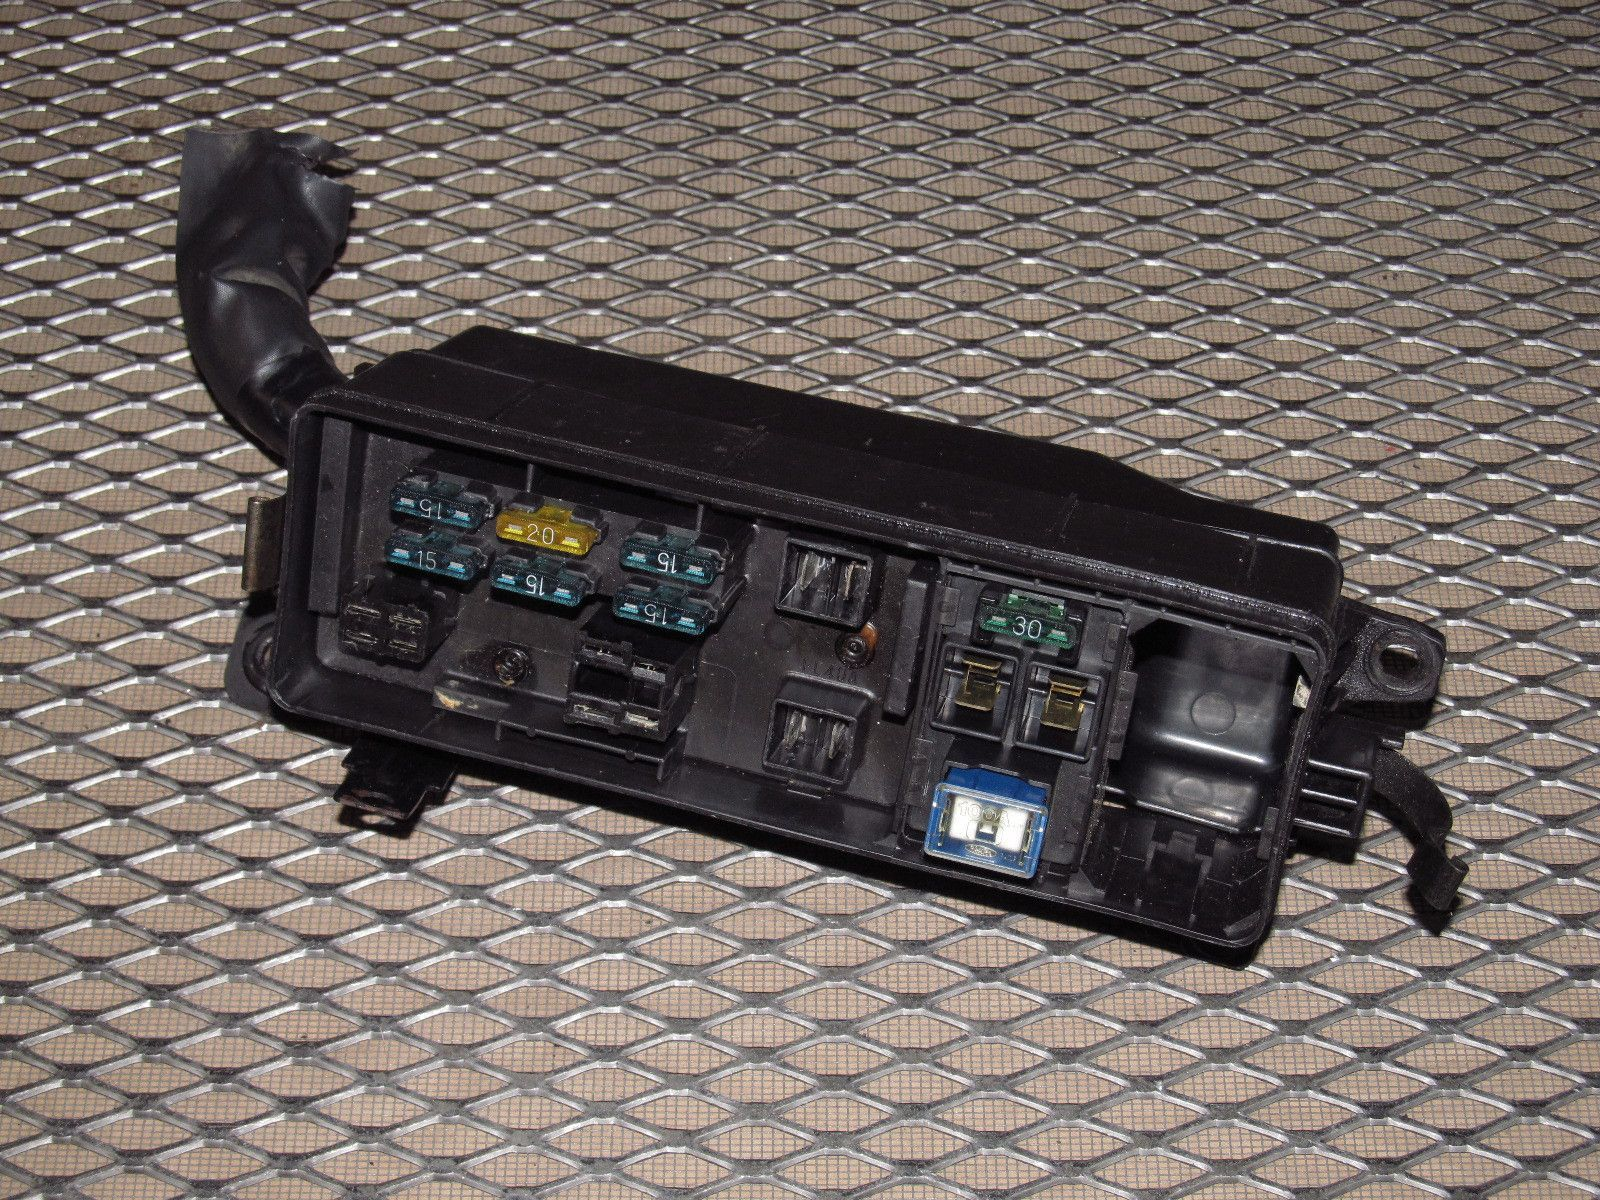 toyota supra fuse box wiring diagram show toyota supra fuse box 89 90 91 92 toyota [ 1600 x 1200 Pixel ]